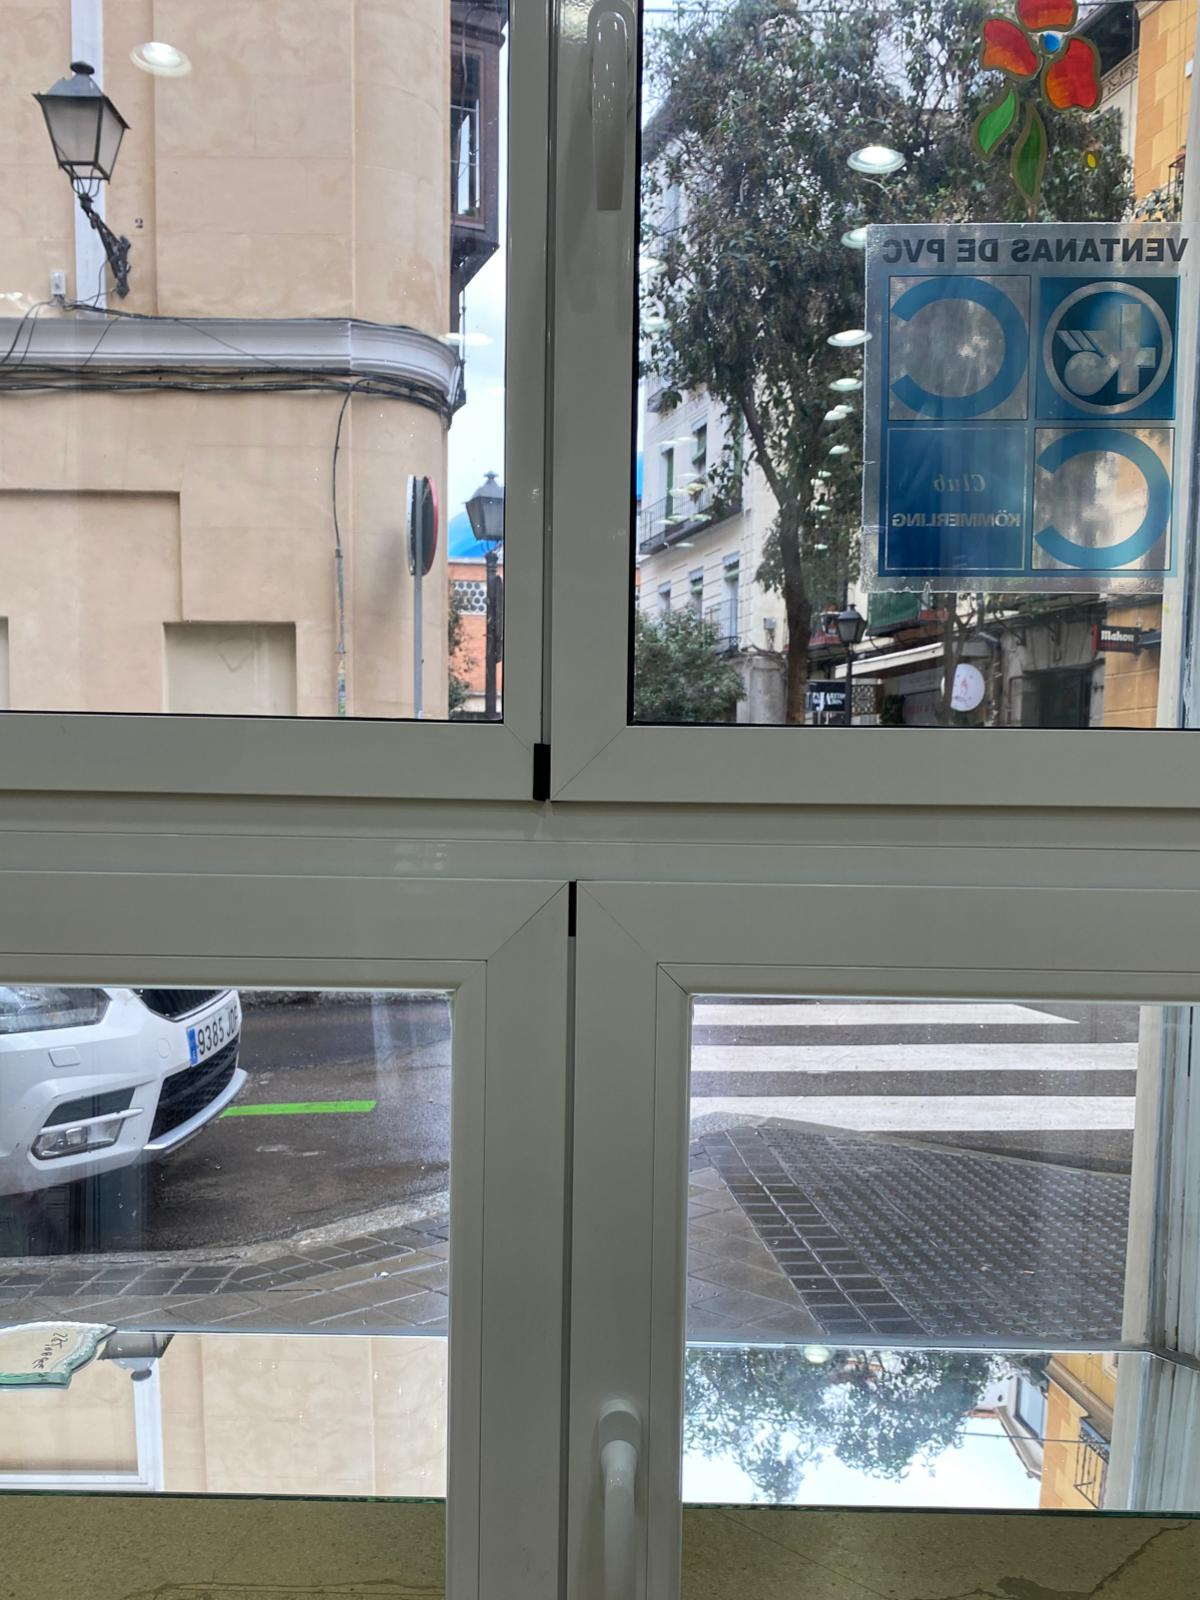 ventanas PVC, ventanas Aluminio rotura puente térmico, ventanas Aluminio Hoja Oculta. Cristalería Formas.JPG